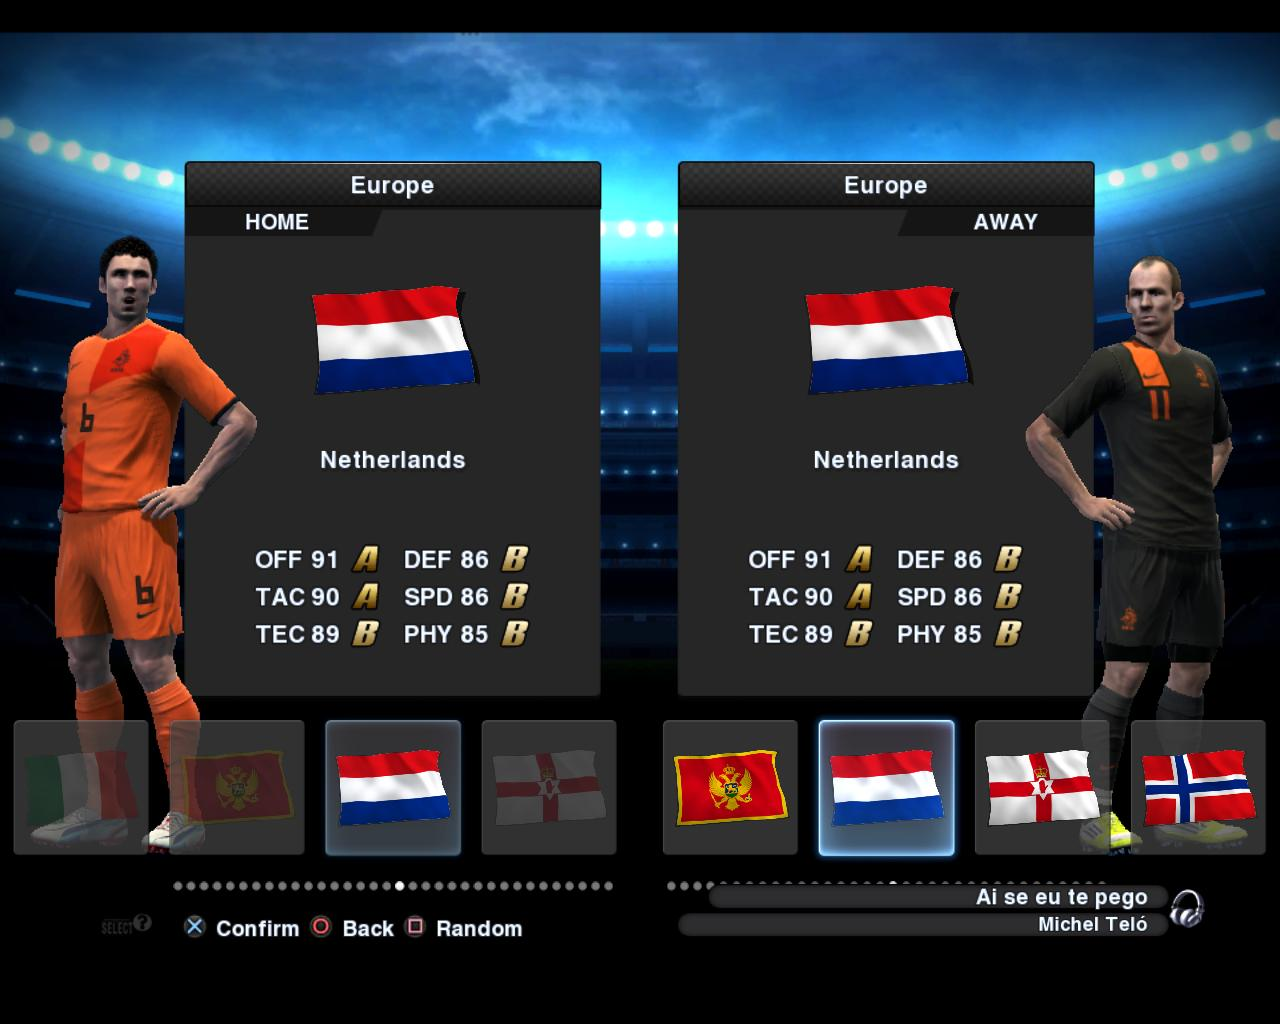 Holanda 2012/13 Kitset - PES 2013